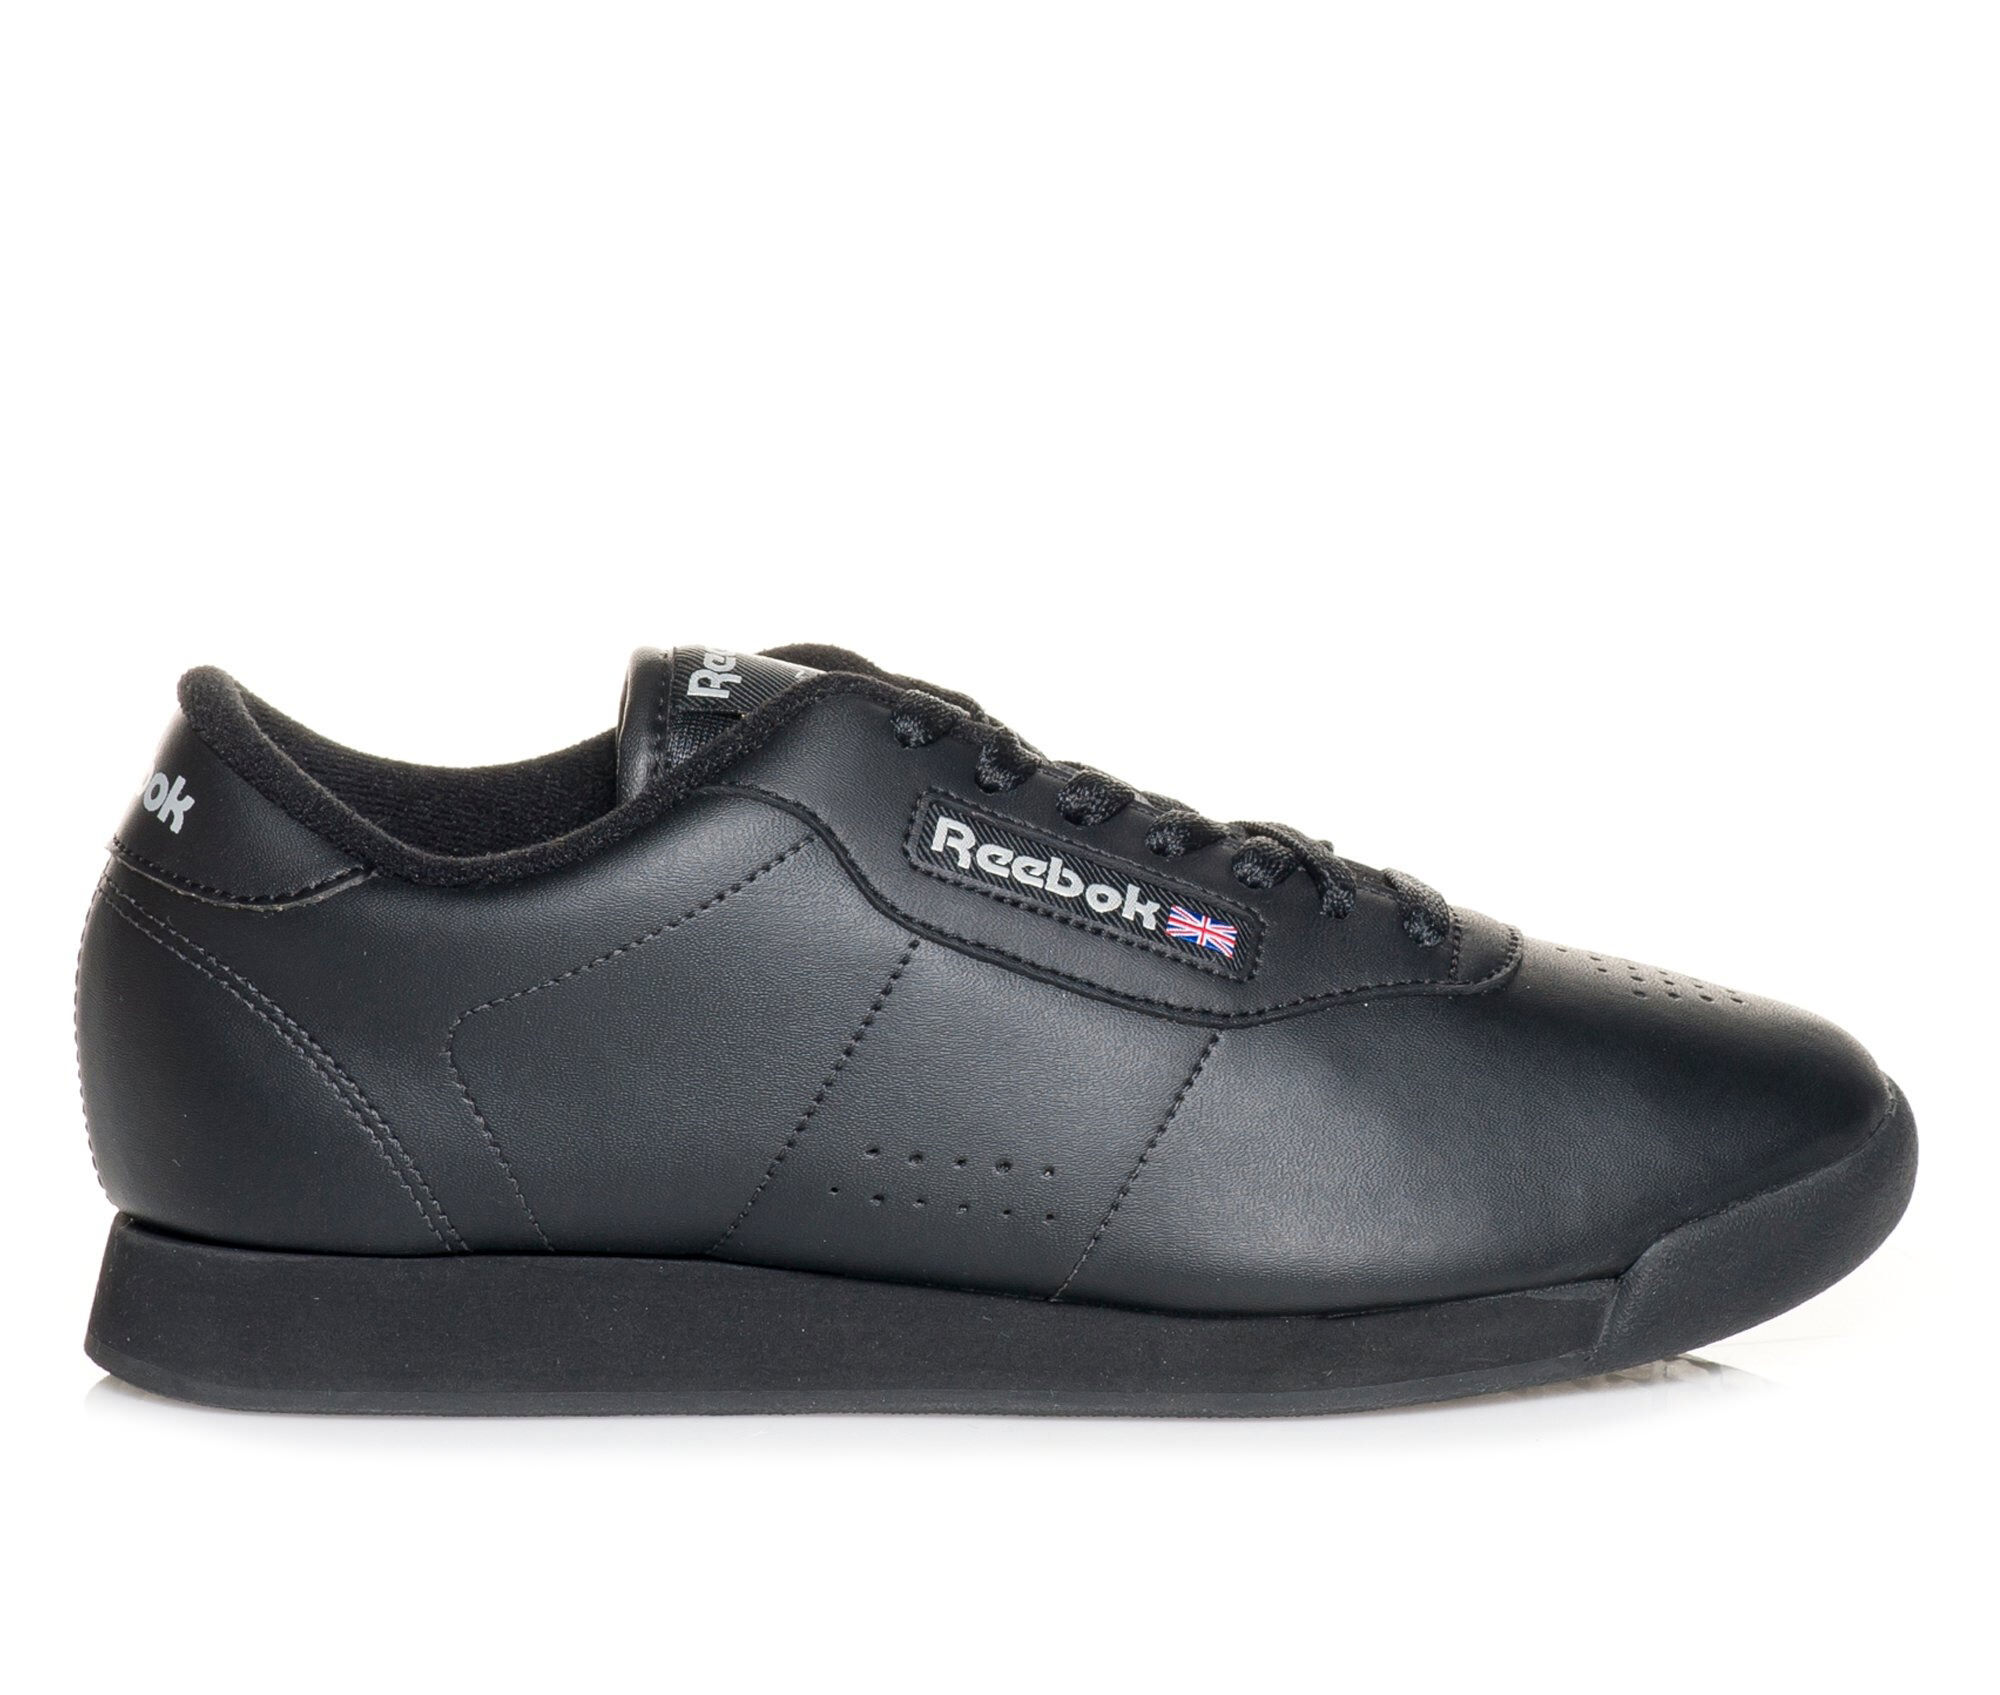 Women's Reebok Princess II Retro Sneakers Black